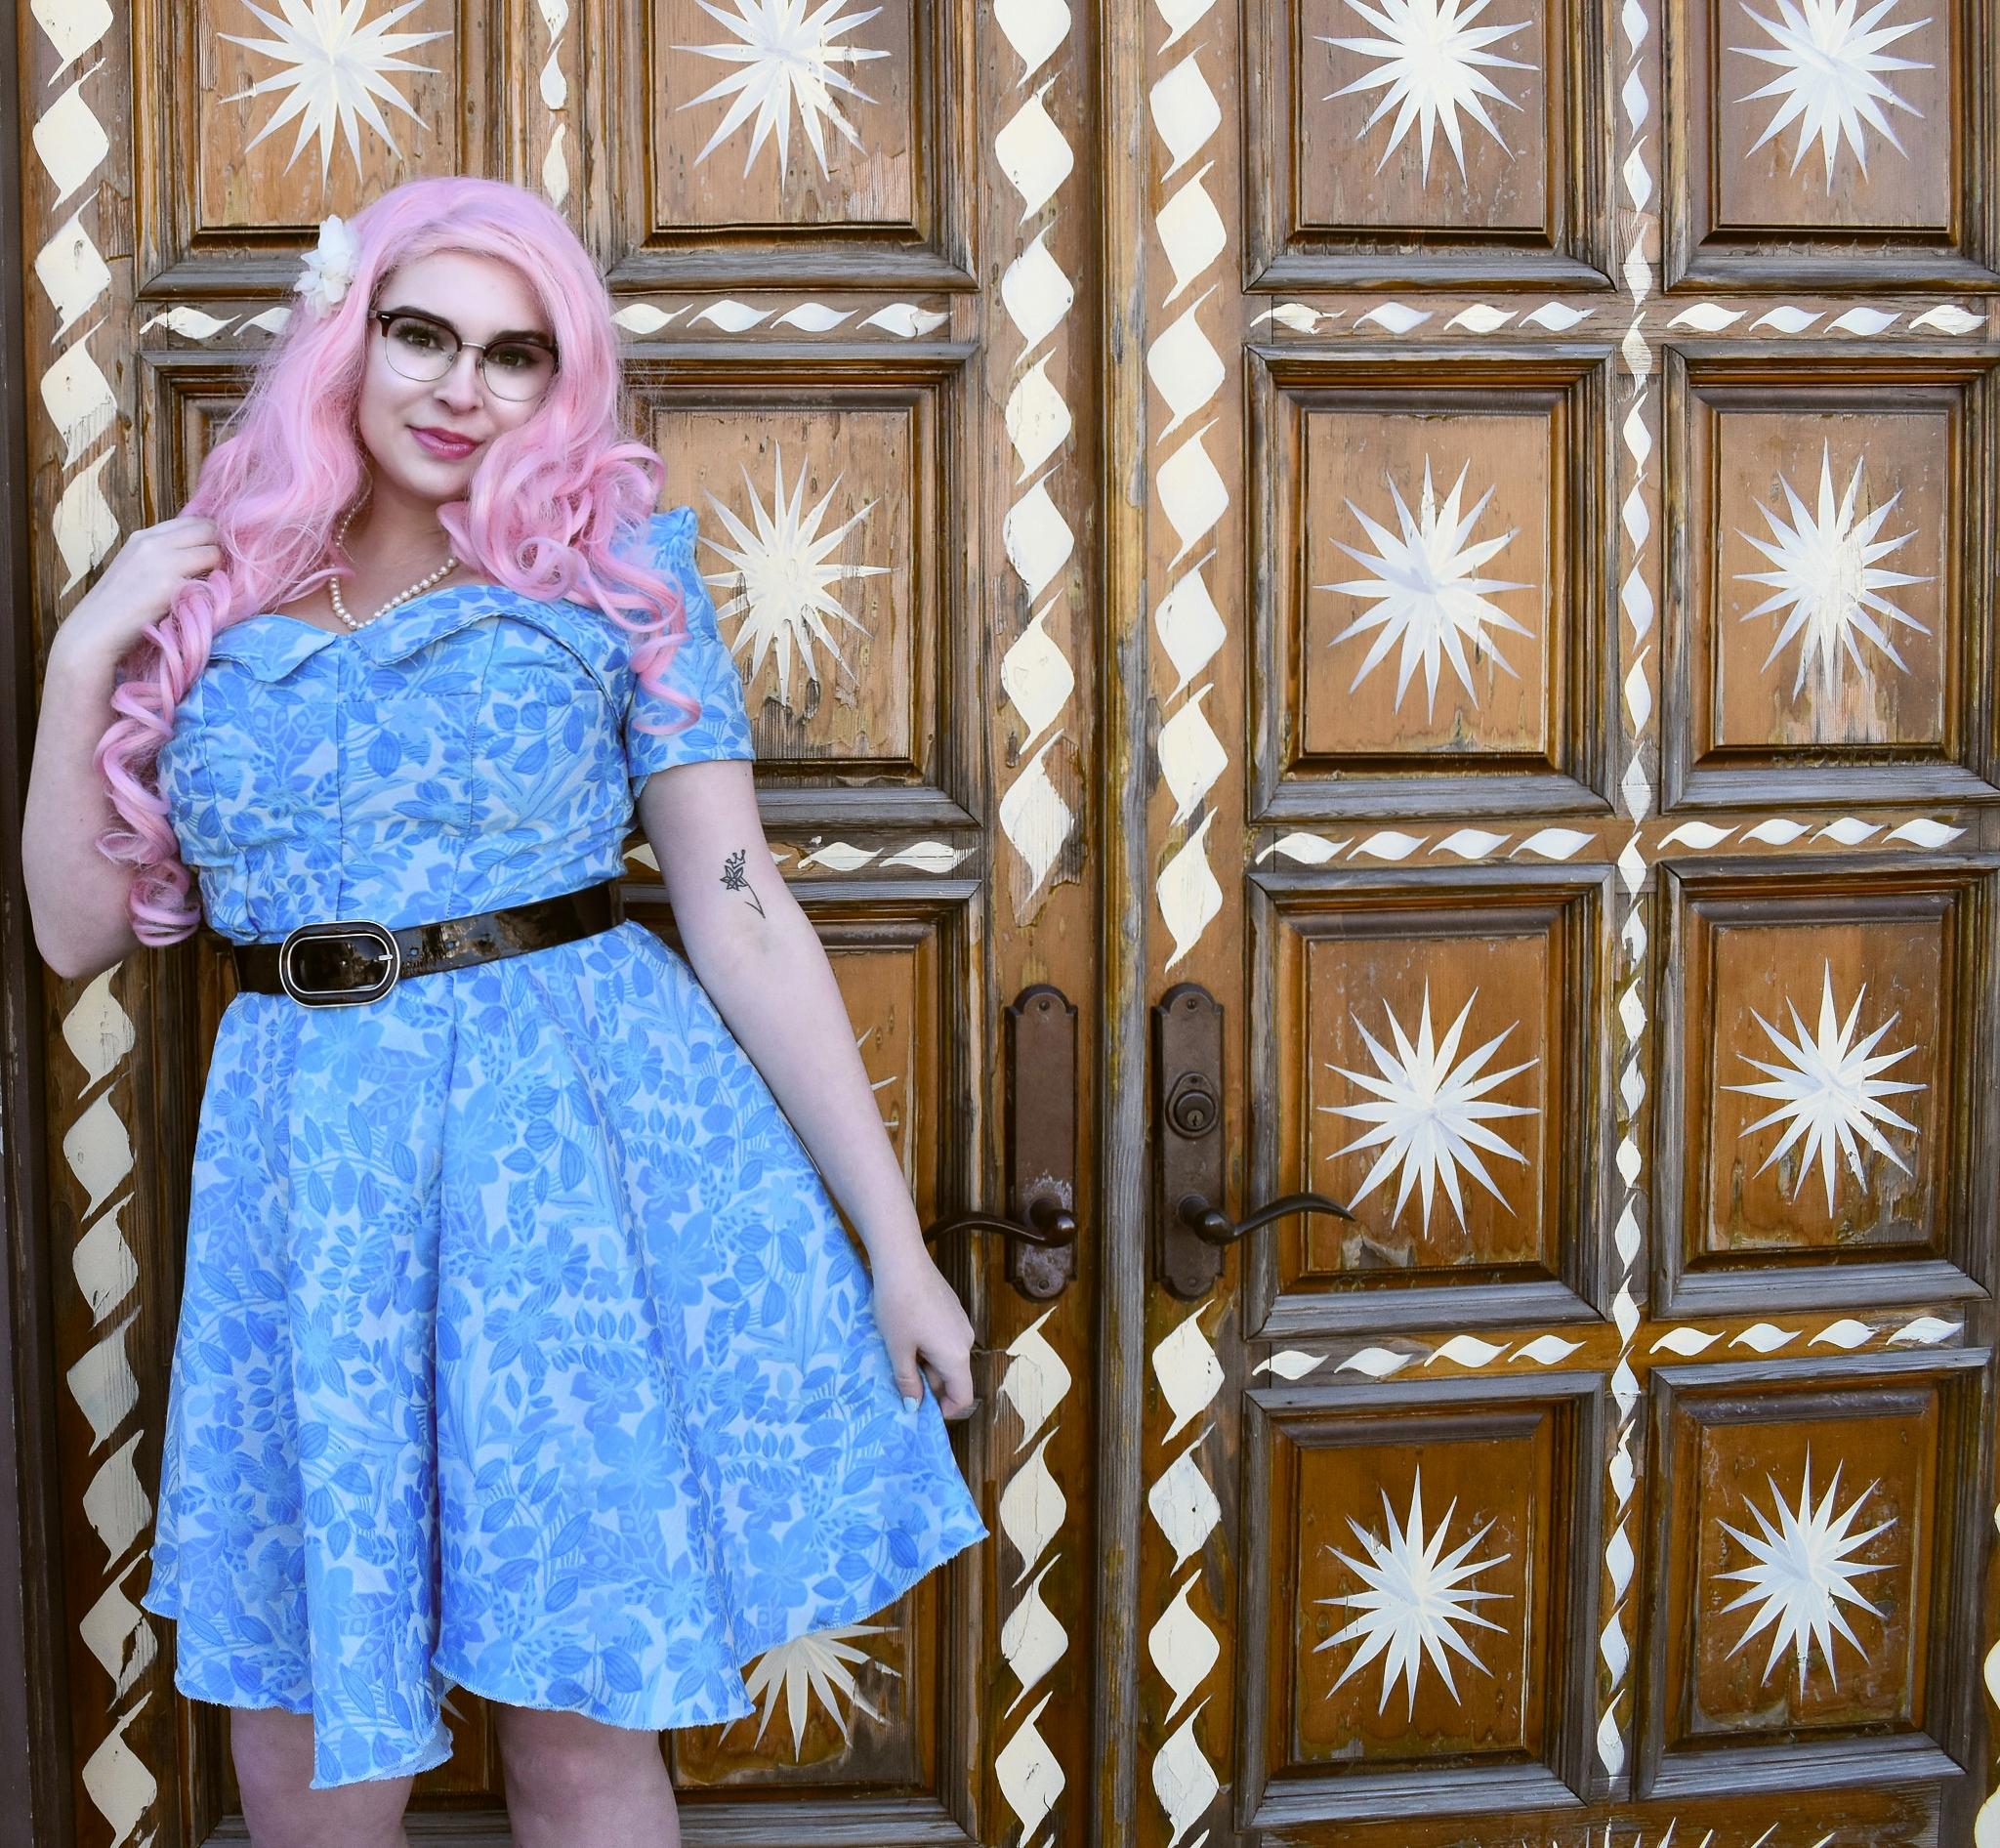 Lochlan O'Neil Blue Pinup Dress